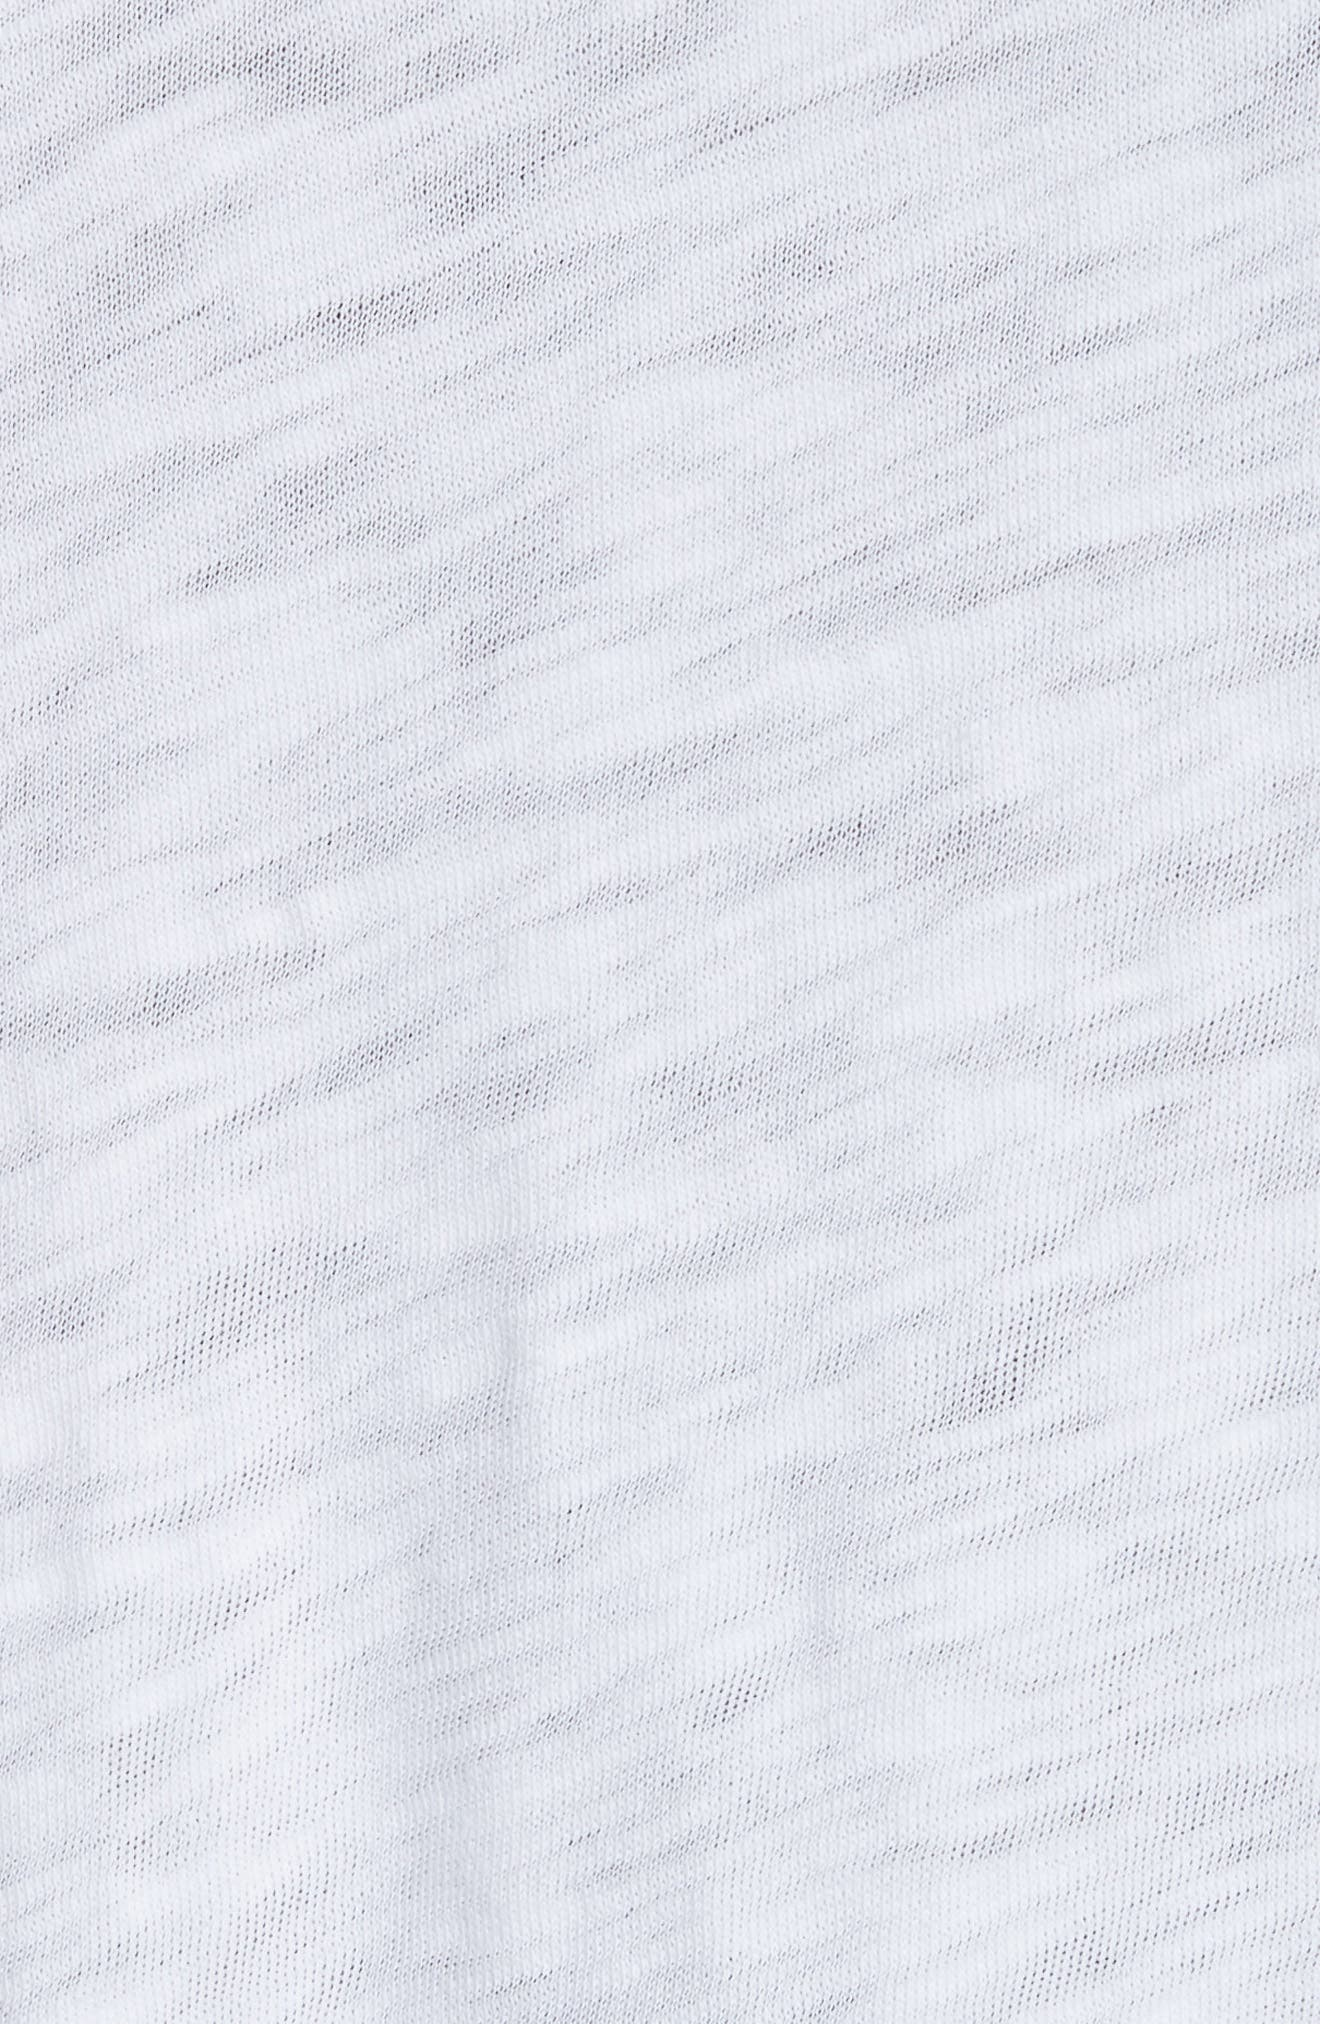 Destroyed Long Sleeve T-Shirt,                             Alternate thumbnail 5, color,                             White